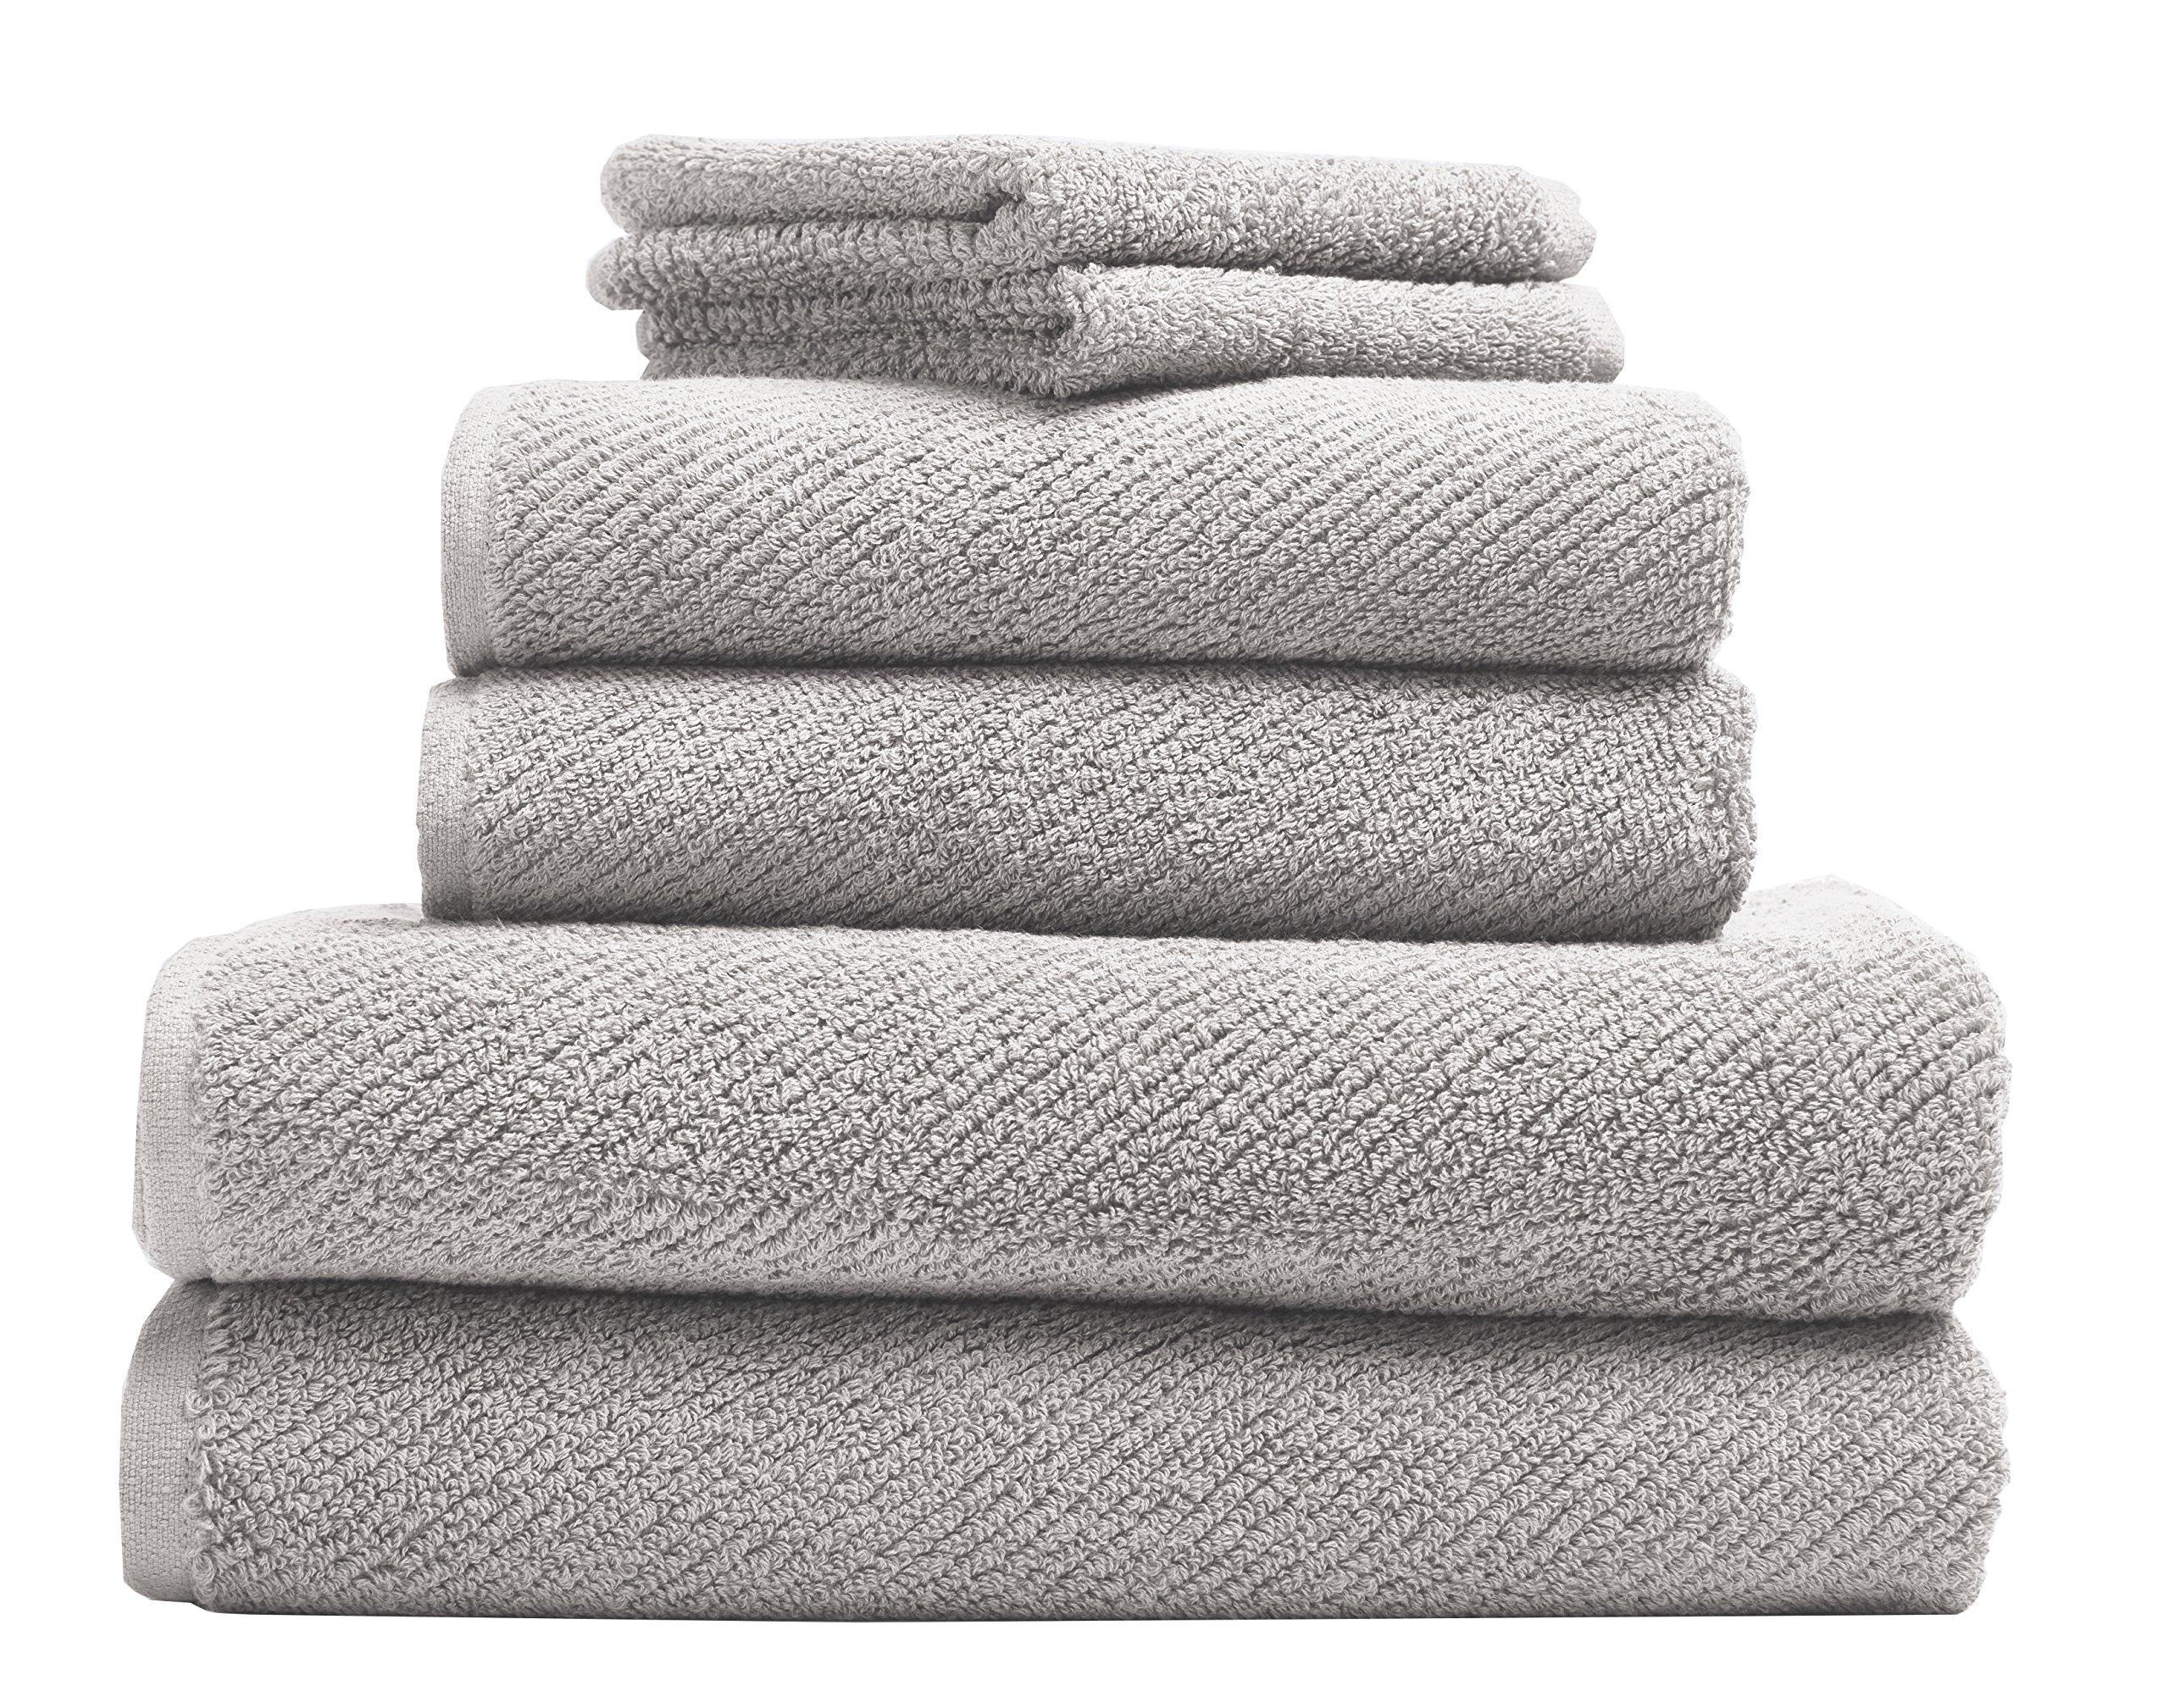 Coyuchi Air Weight Organic 6pc Towel Set, BT, HT, WC, Fog